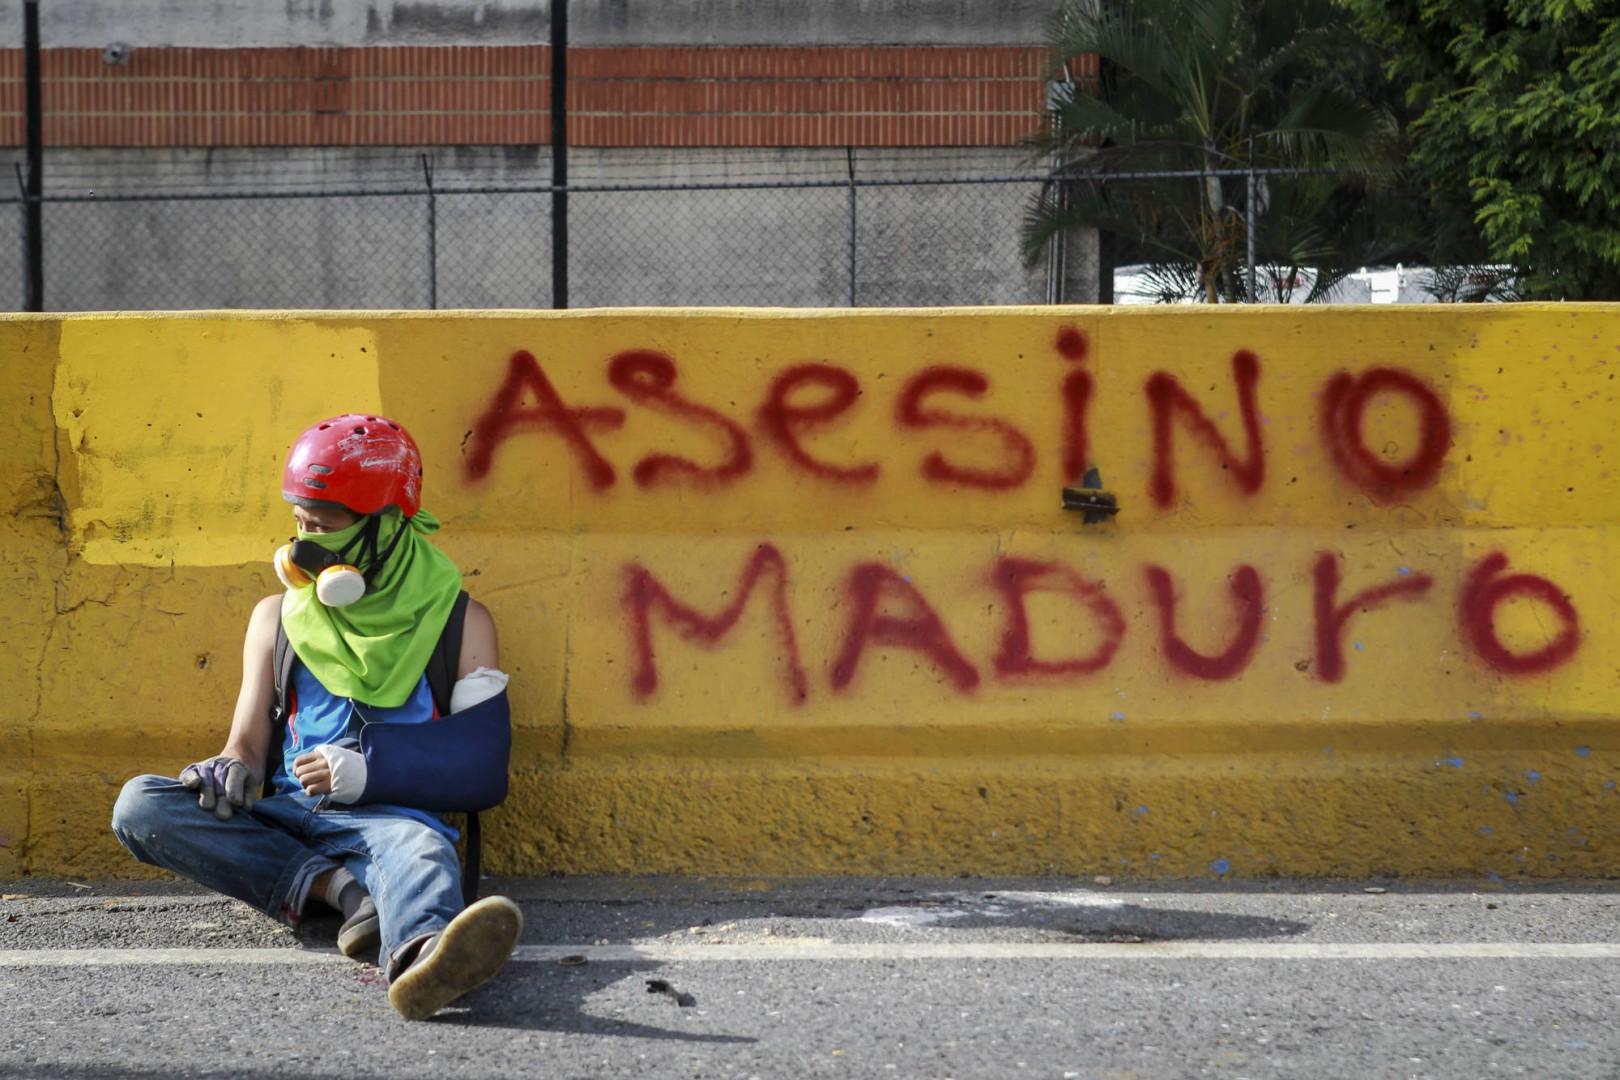 Proteste in Venezuela - ELYXANDRO CEGARRA VIA ZUMA WIRE